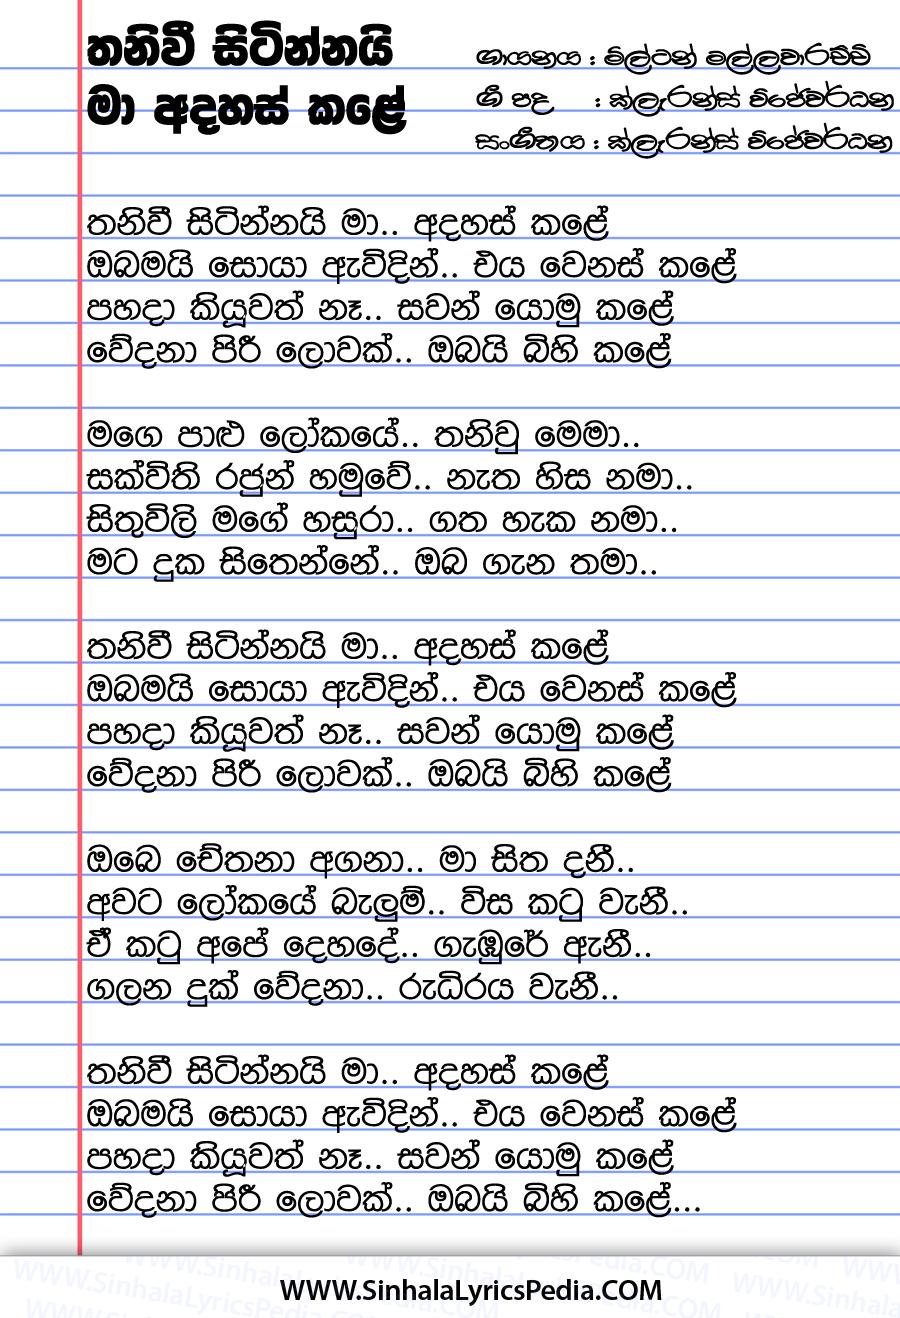 Thaniwee Sitinnai Ma Adahas Kale Song Lyrics